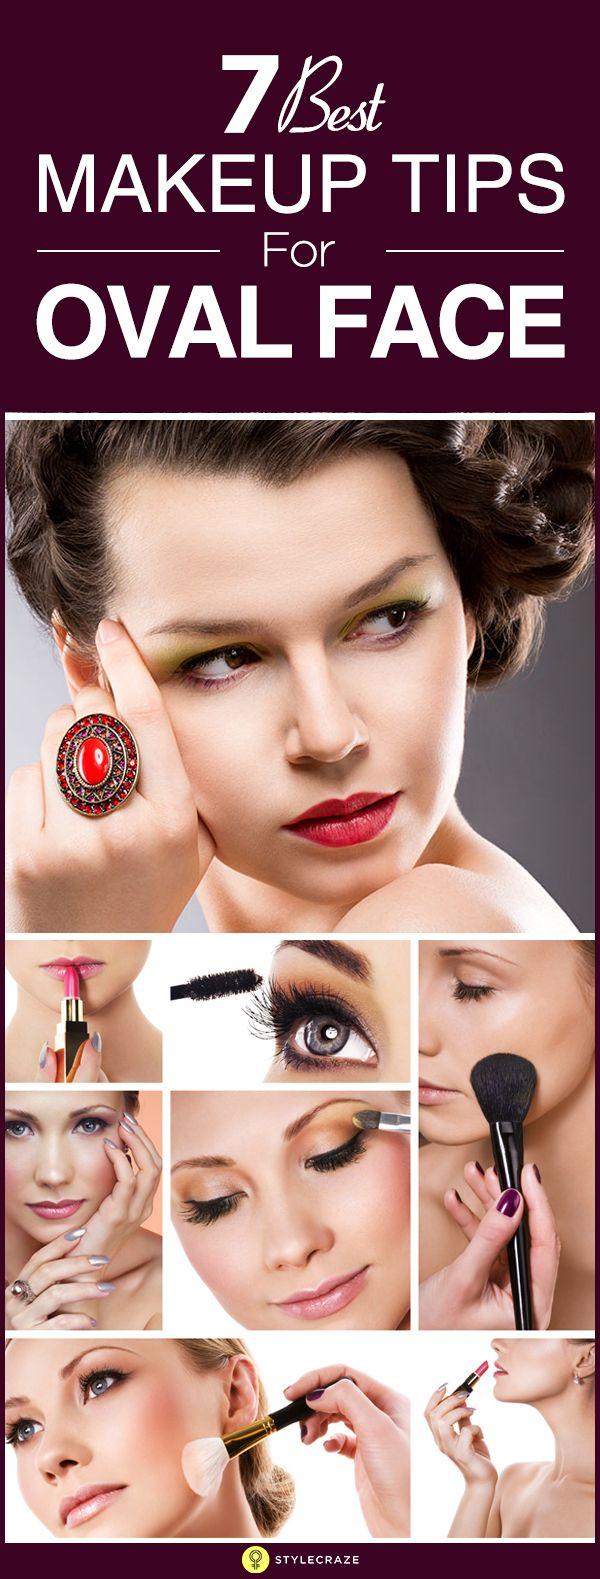 7 Best Makeup Tips For Oval Face Best makeup tips, Best